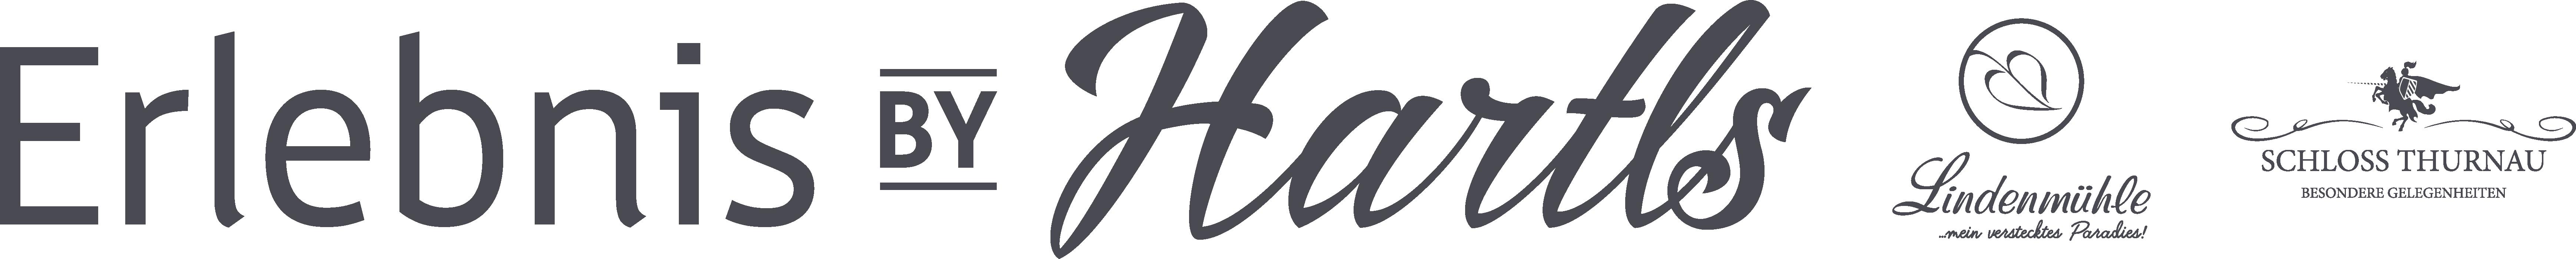 Arrangements, Events und Erlebnisgastronomie – hartls.eu